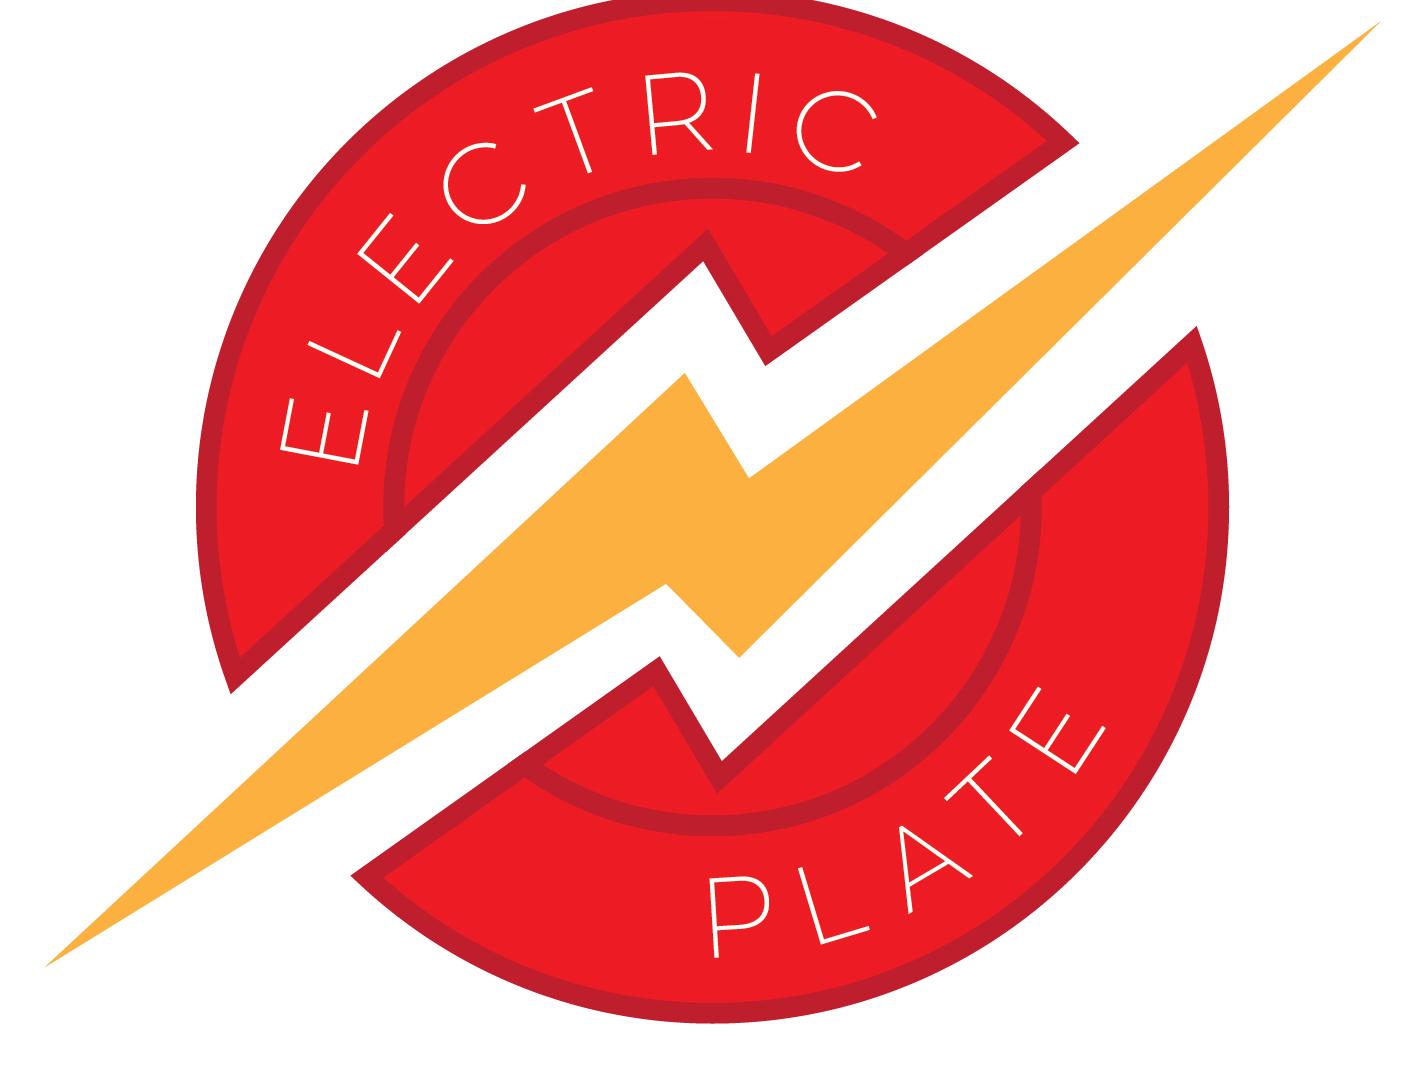 Electric Plate Official Logo 01 illustration logo design branding